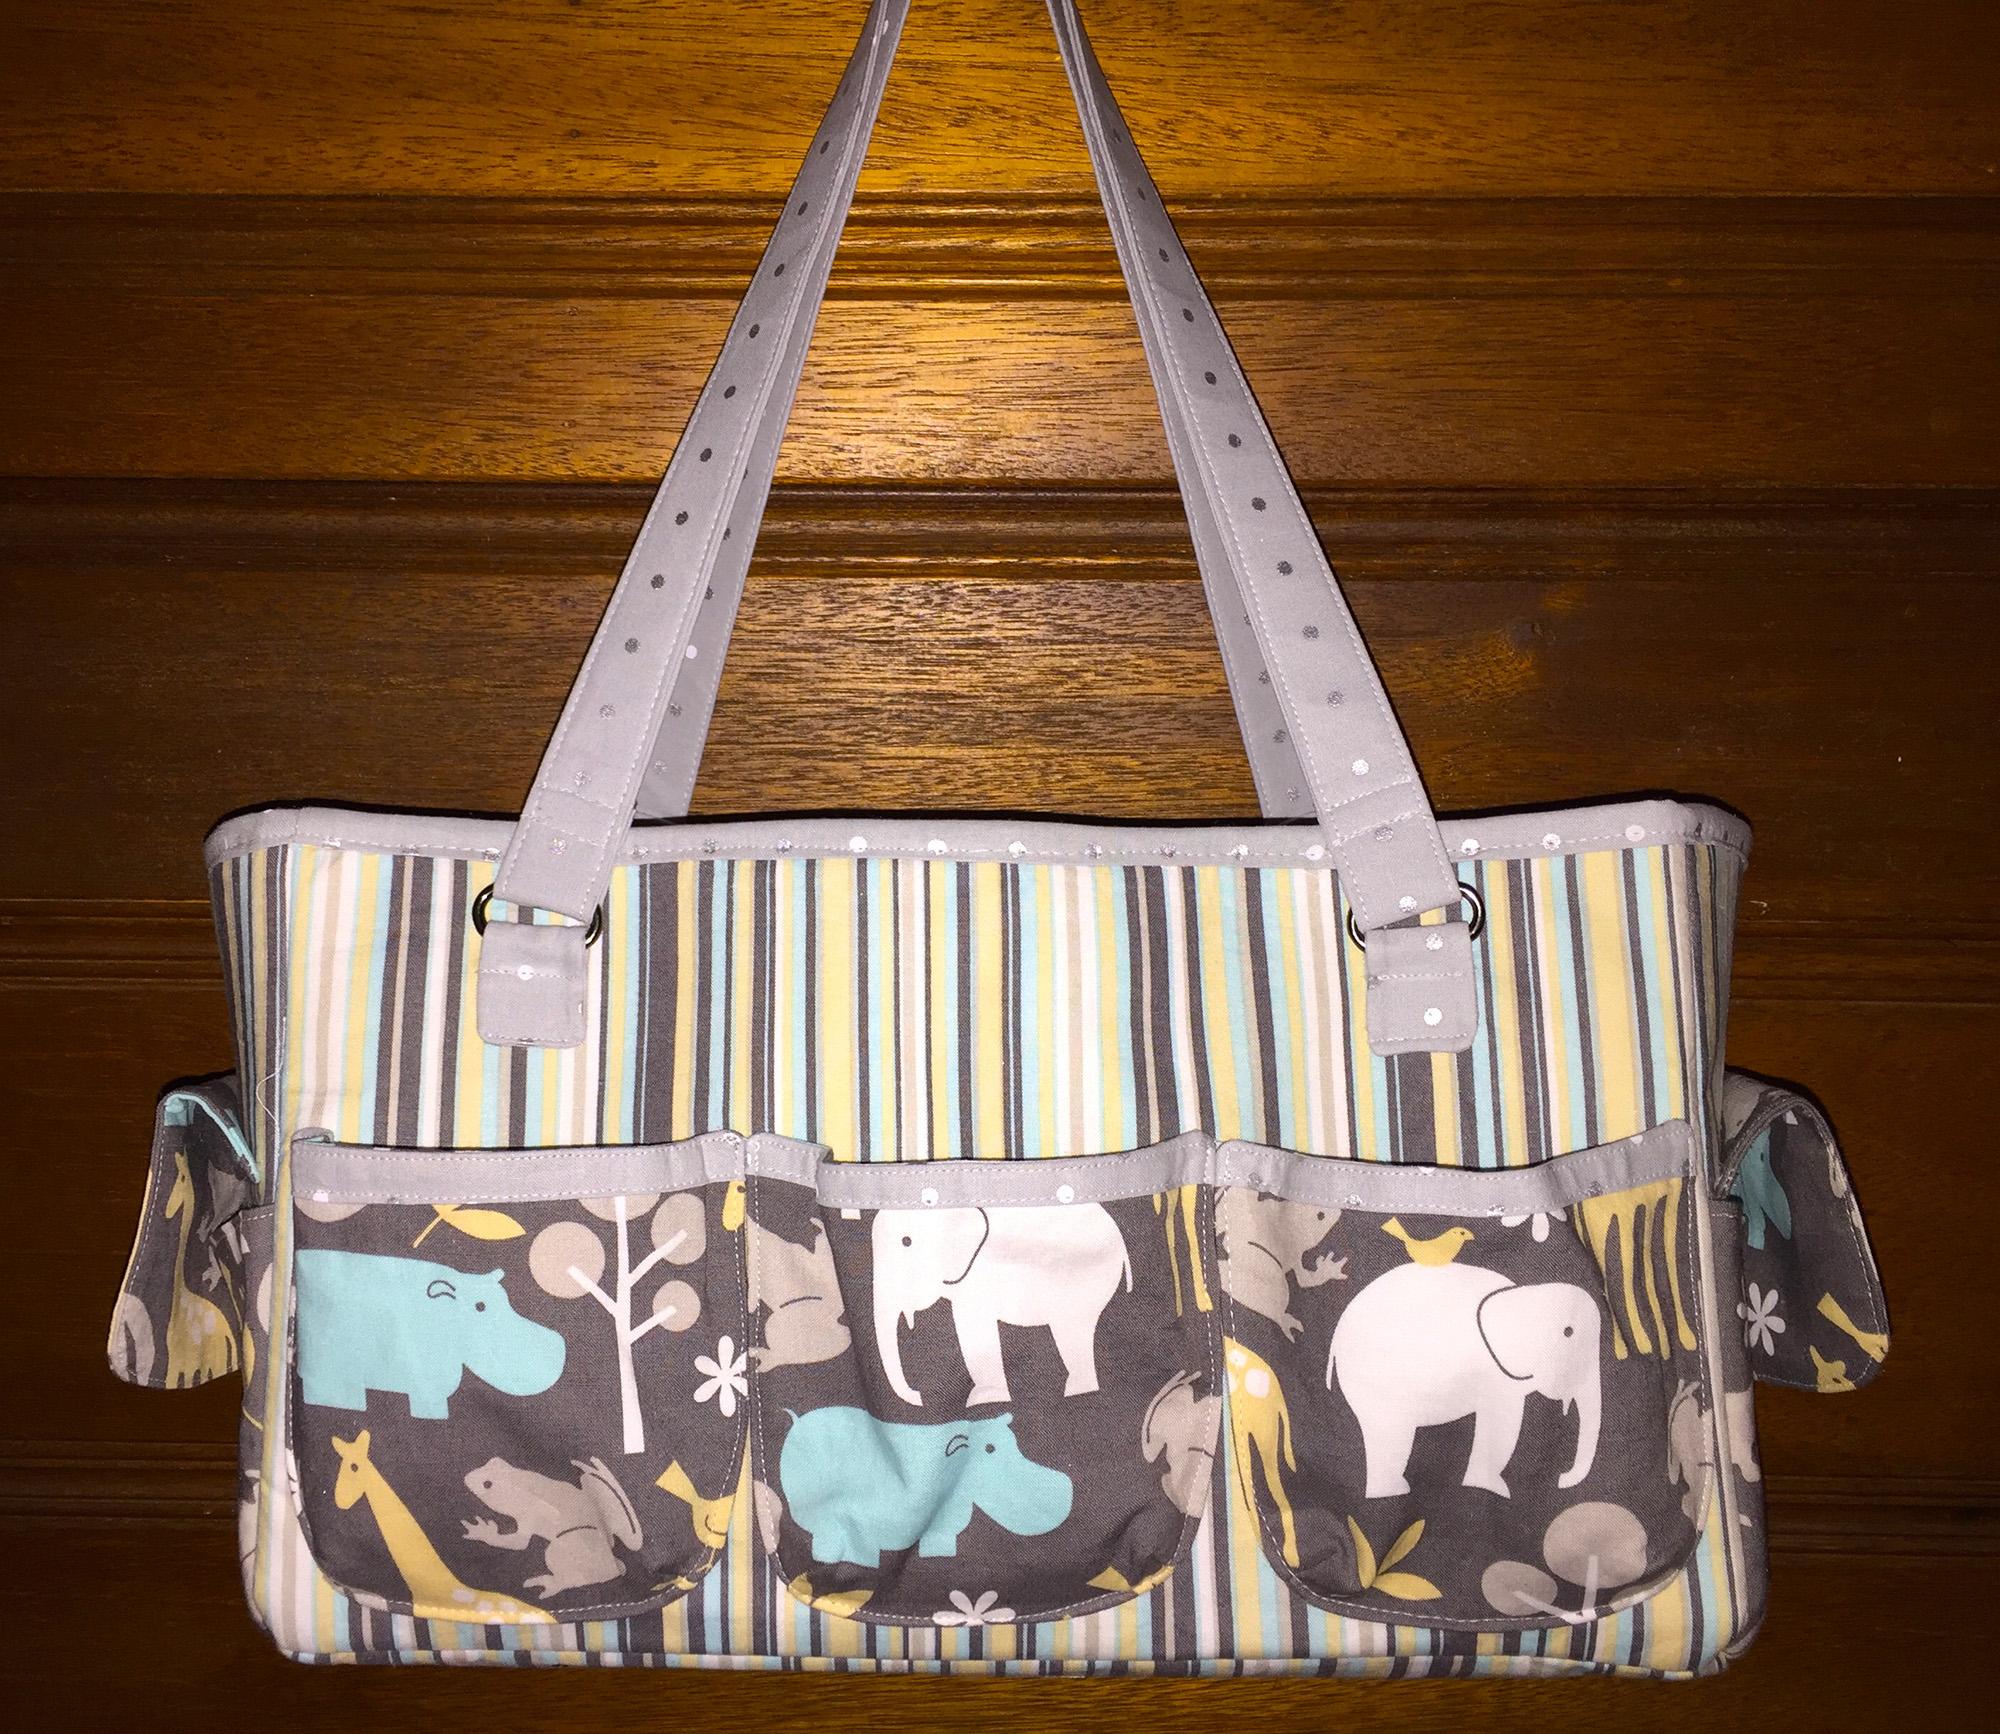 Sew Sweetness Oslo Craft Bag, sewn by Susan of SB Stitching